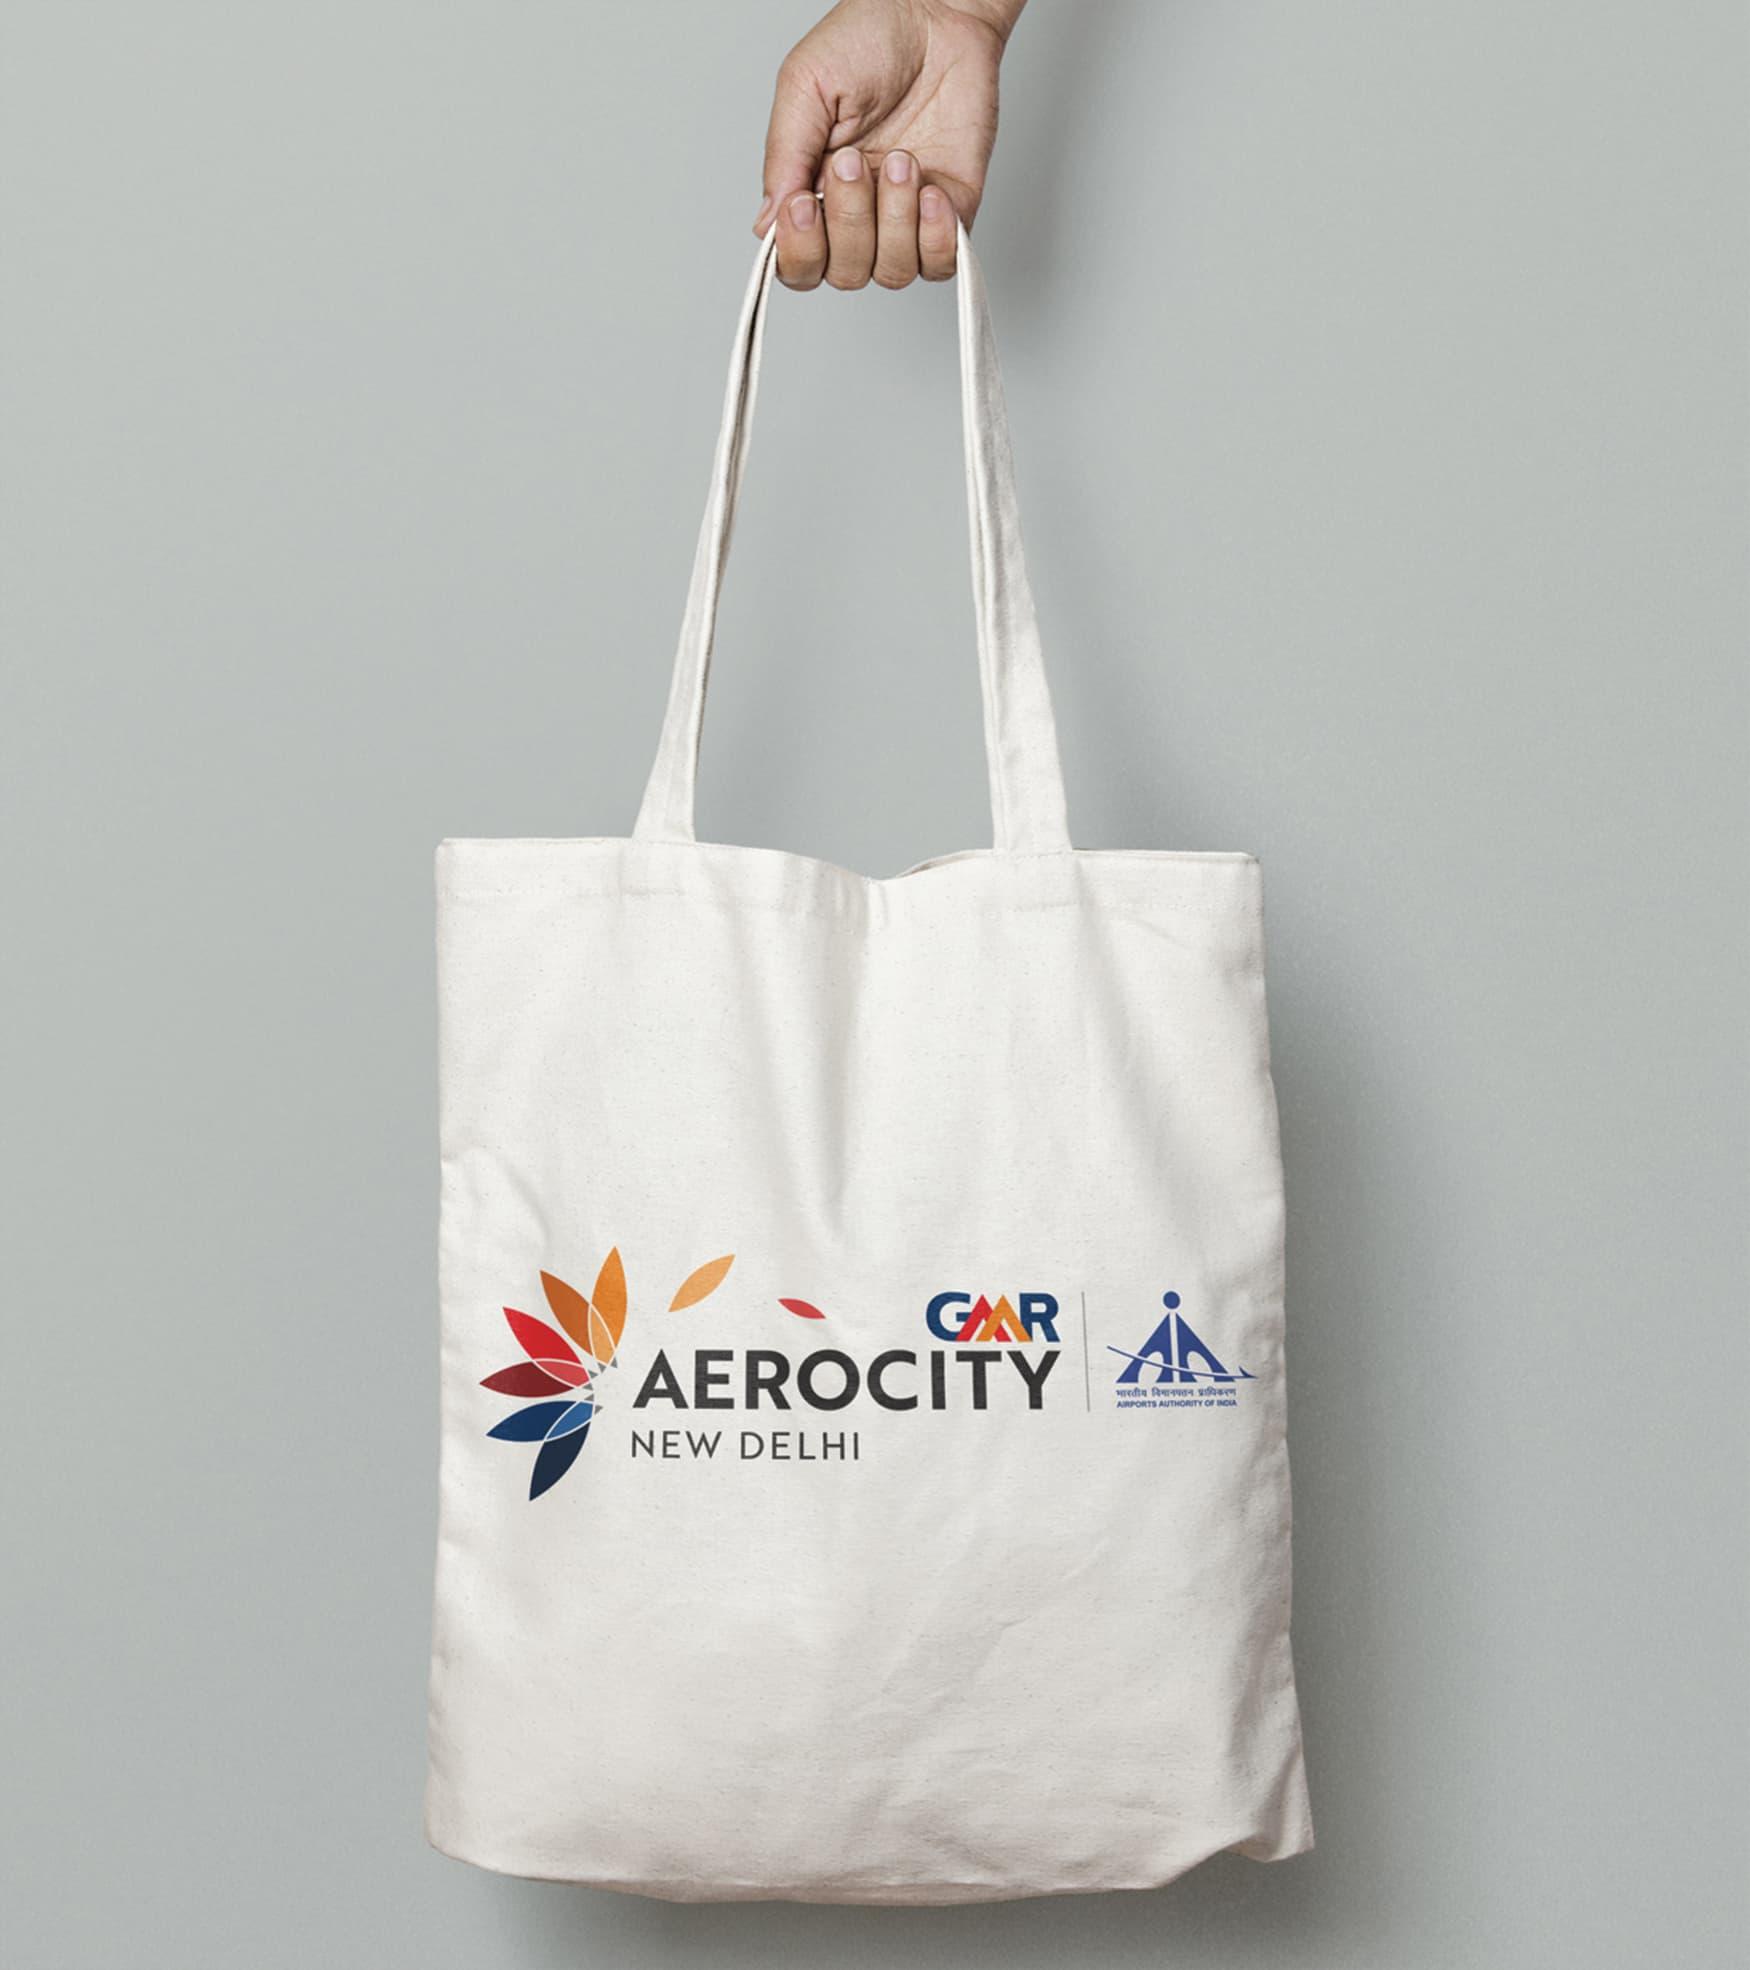 Aerocity, New Delhi, India, branded tote bag